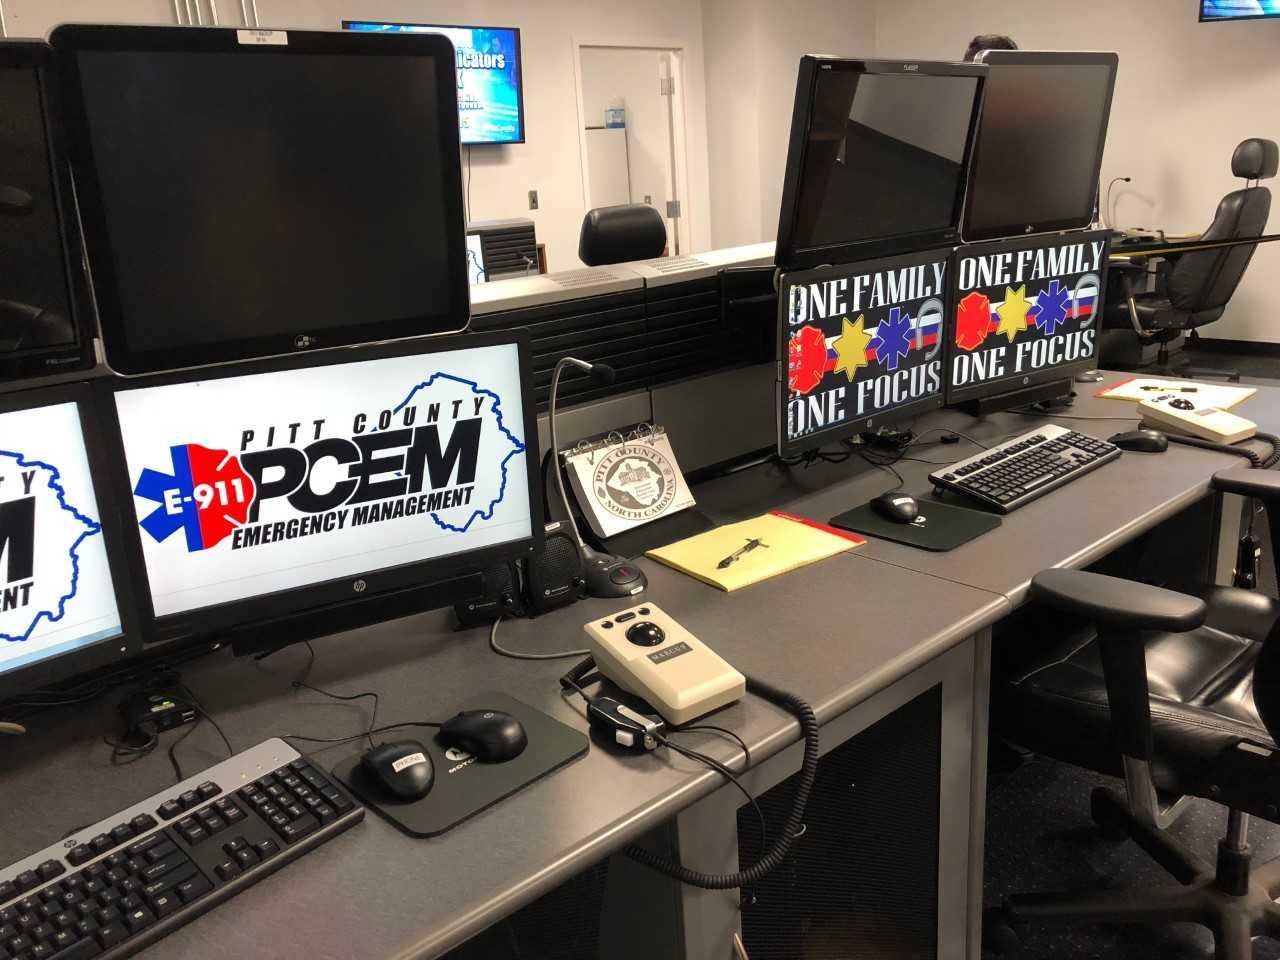 911 Center Equipment